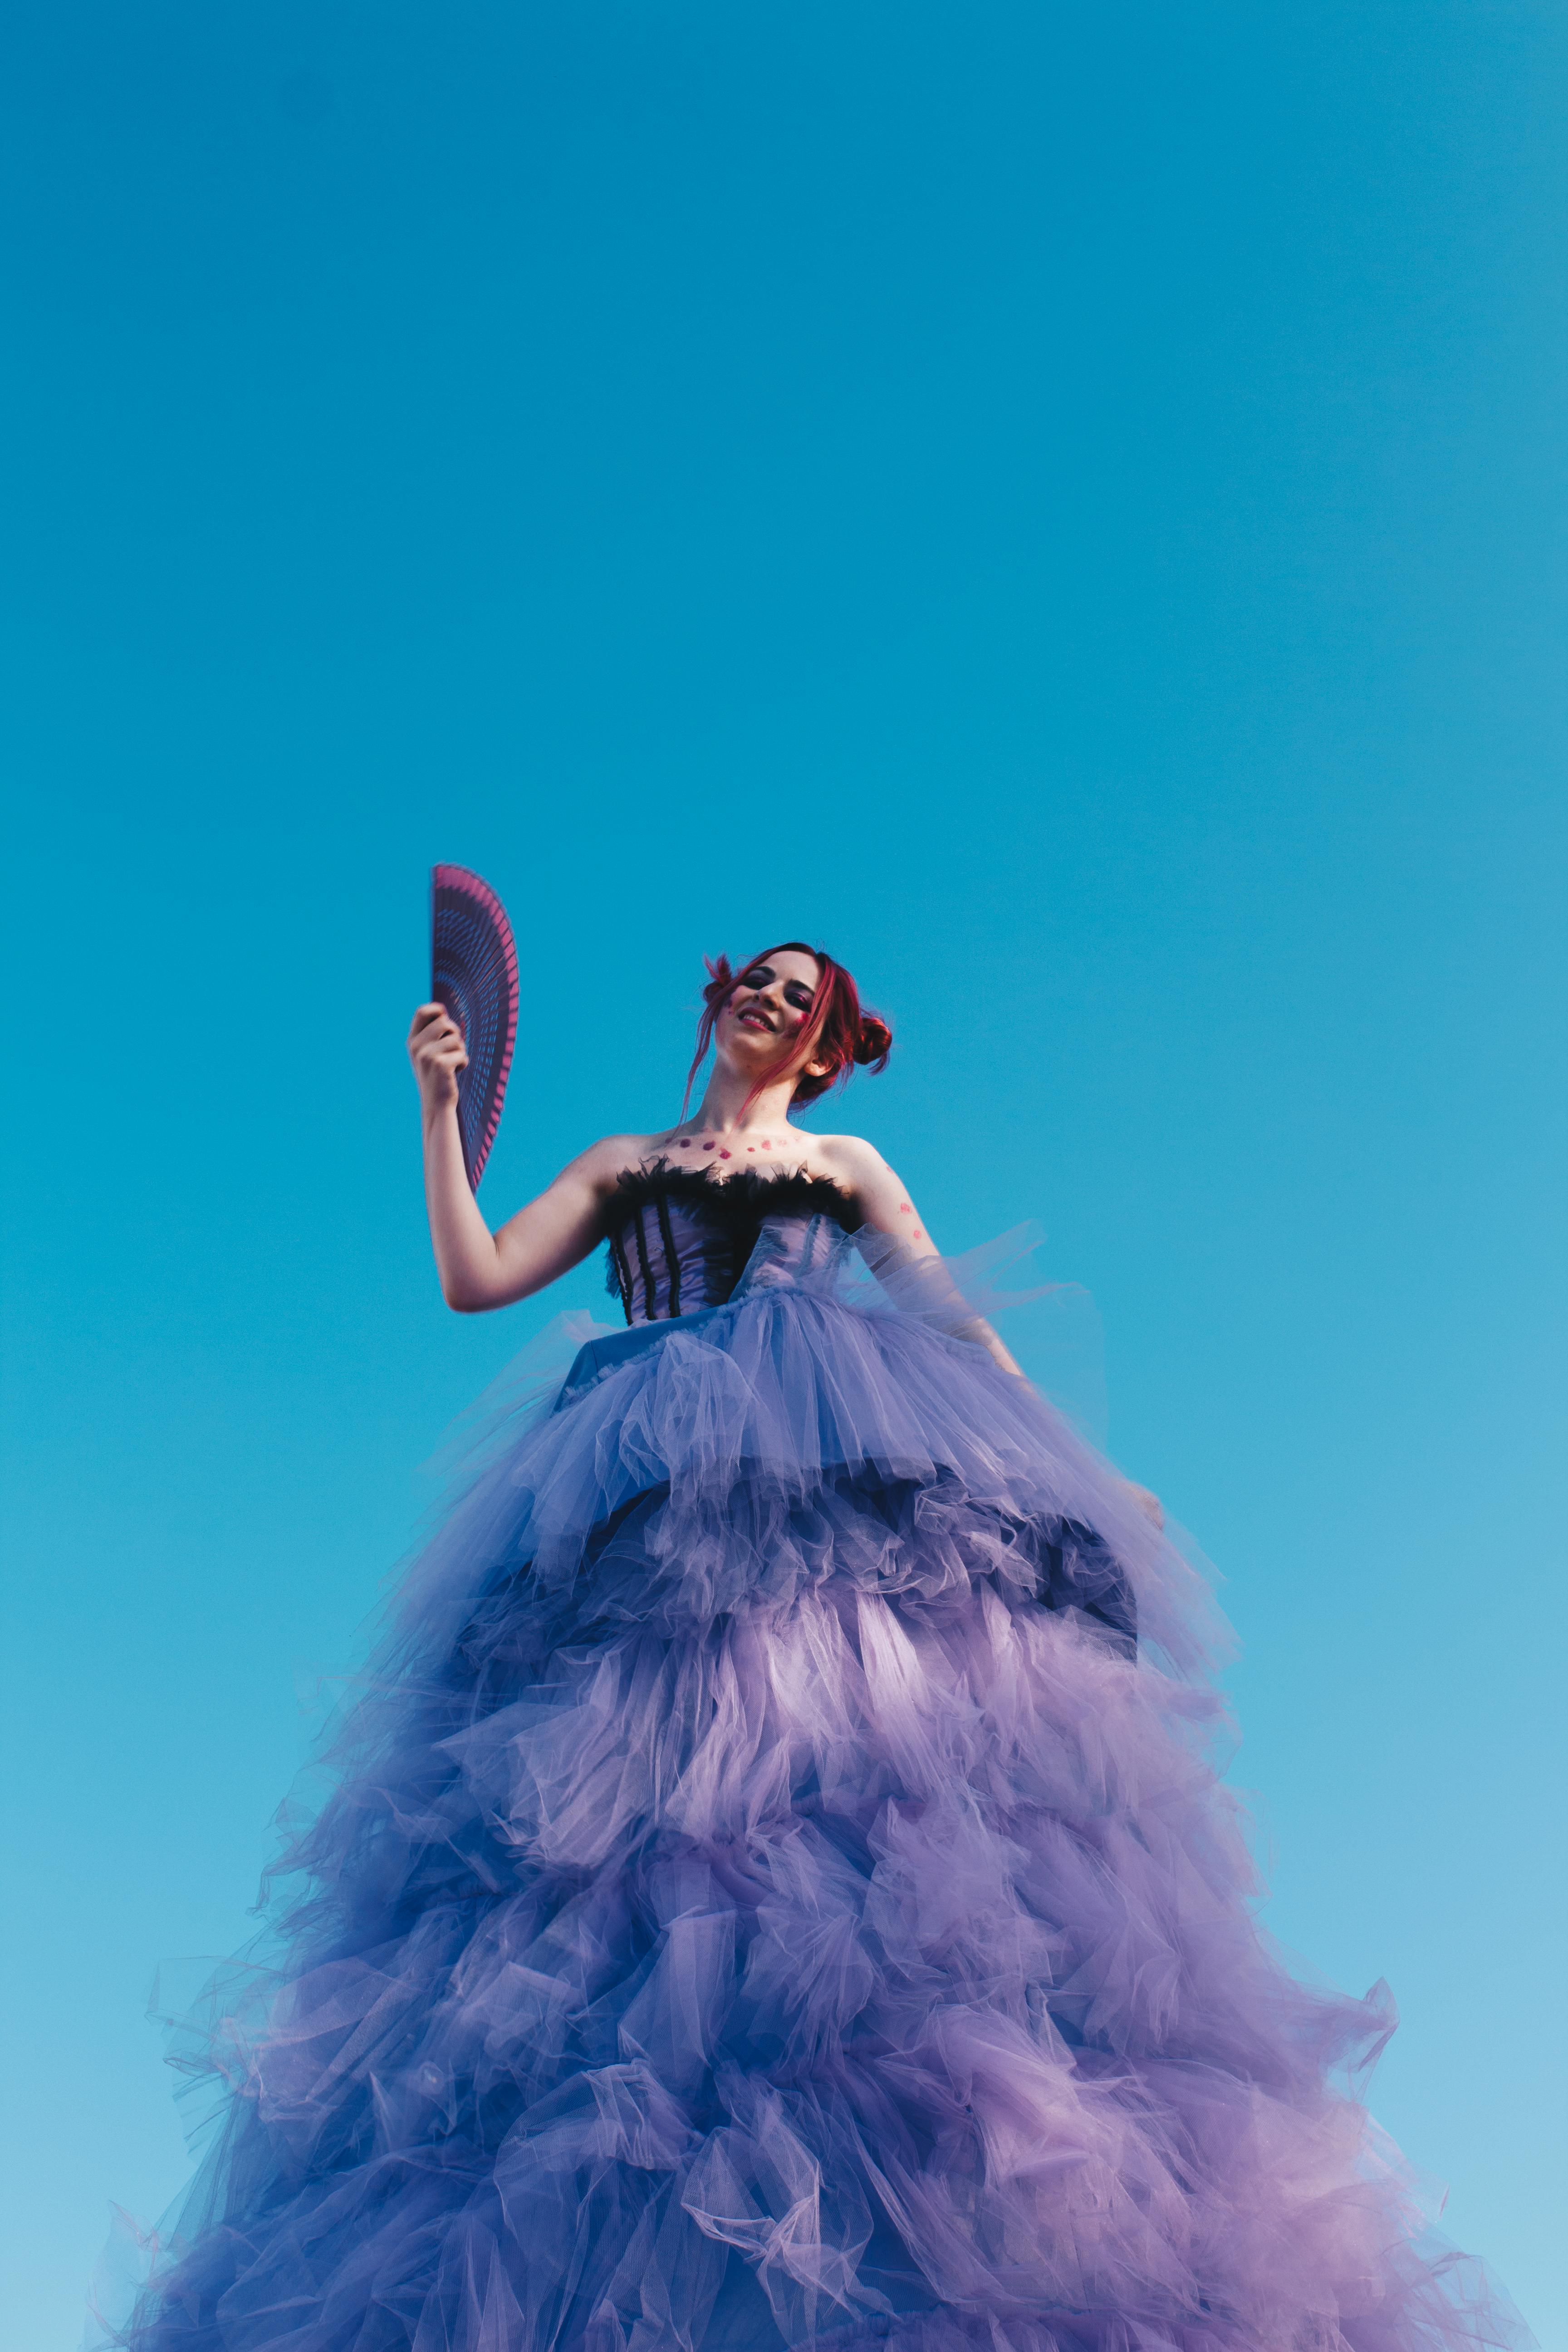 Woman in Black and Purple Ruffle Dress Holding Hand Fan, Action, Model, Wear, Veil, HQ Photo